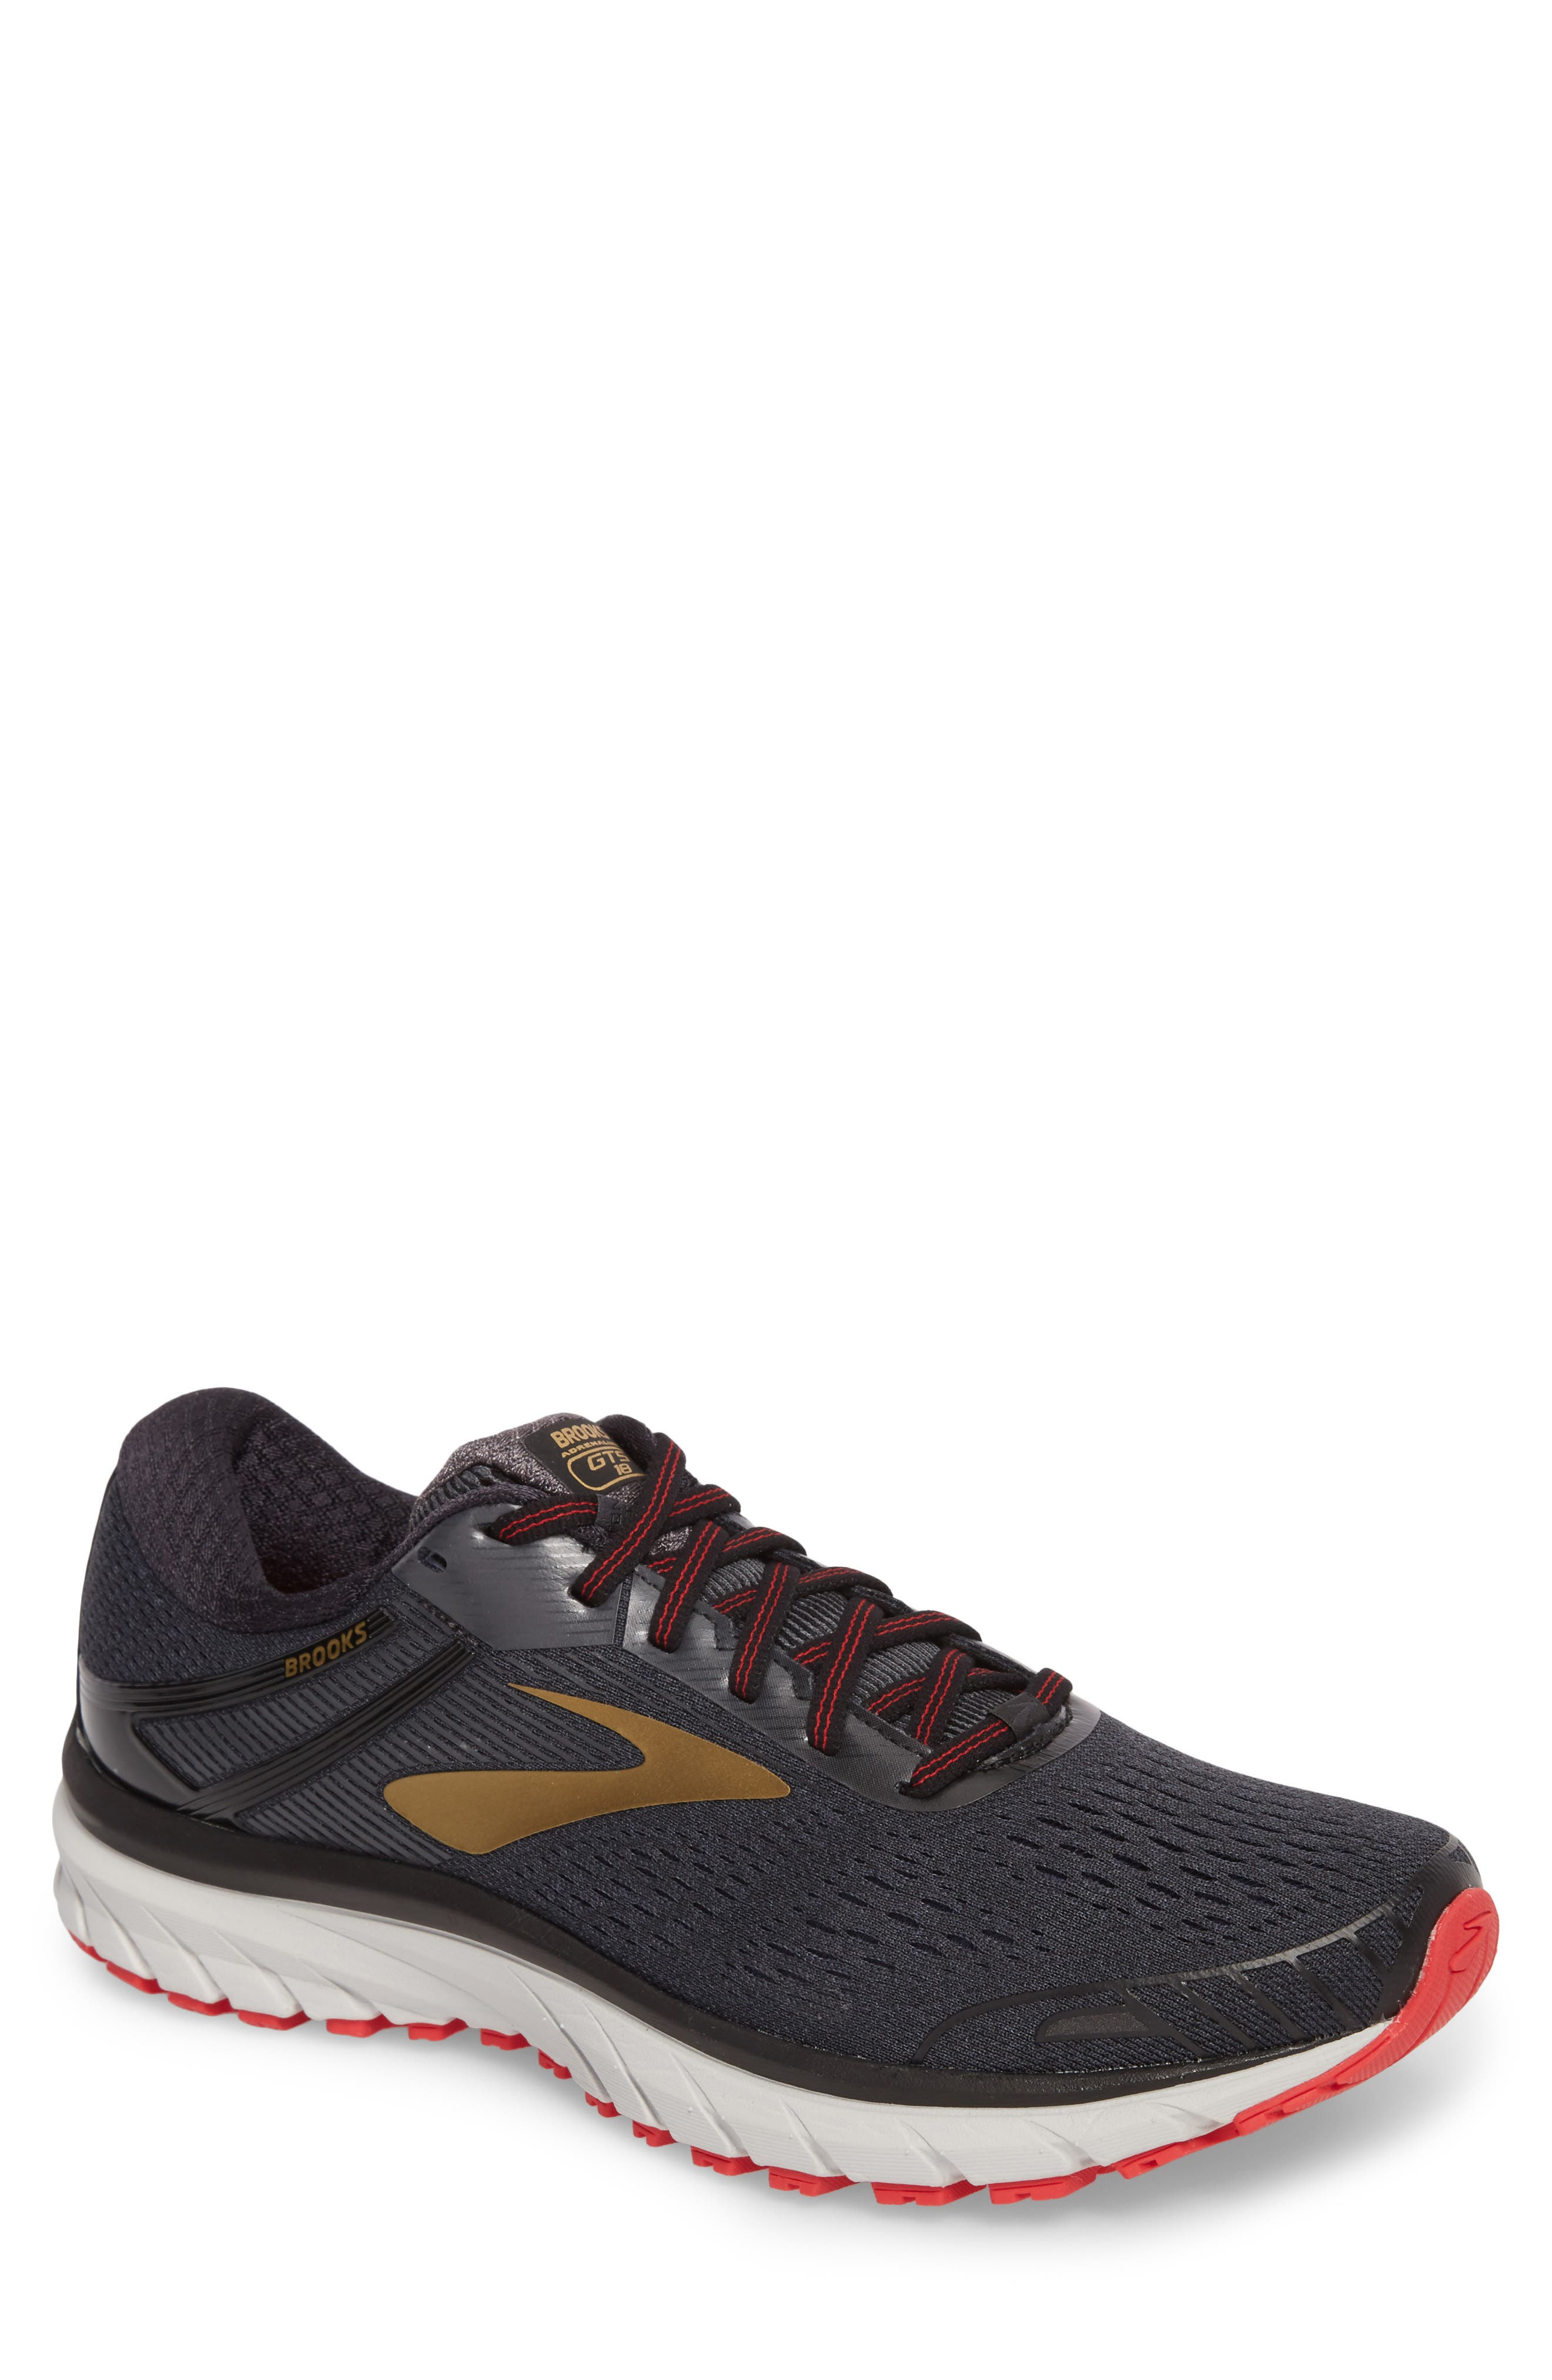 Main Image - Brooks Adrenaline GTS 18 Running Shoe (Men)